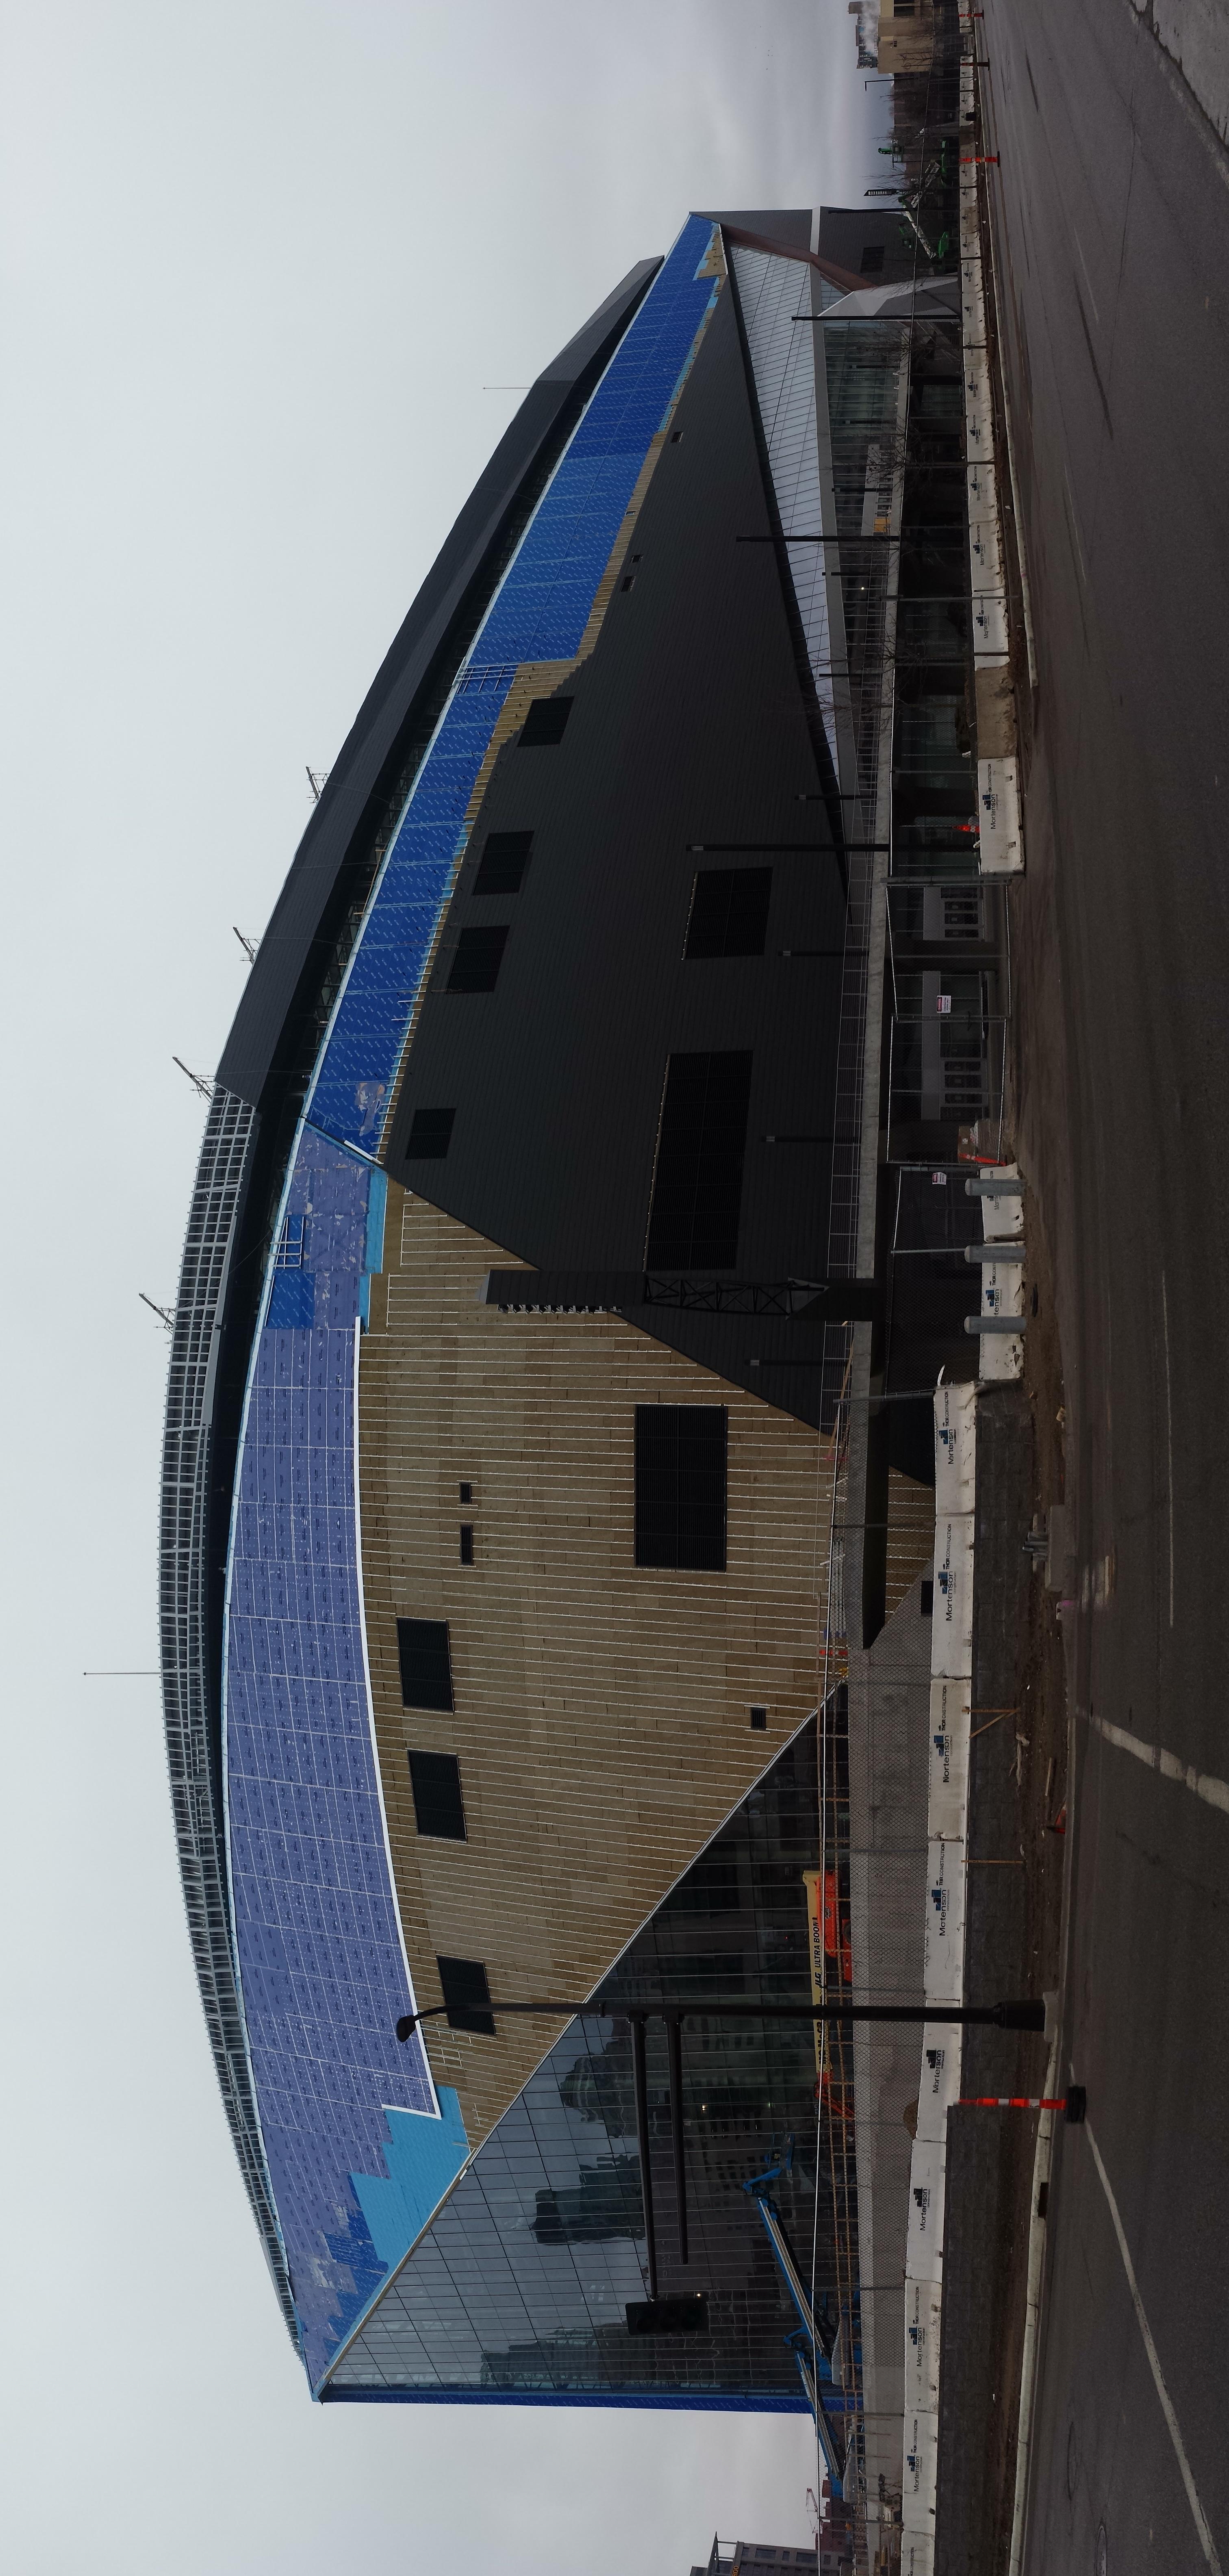 Leaky Gutter Damage To The New Minnesota Vikings Stadium